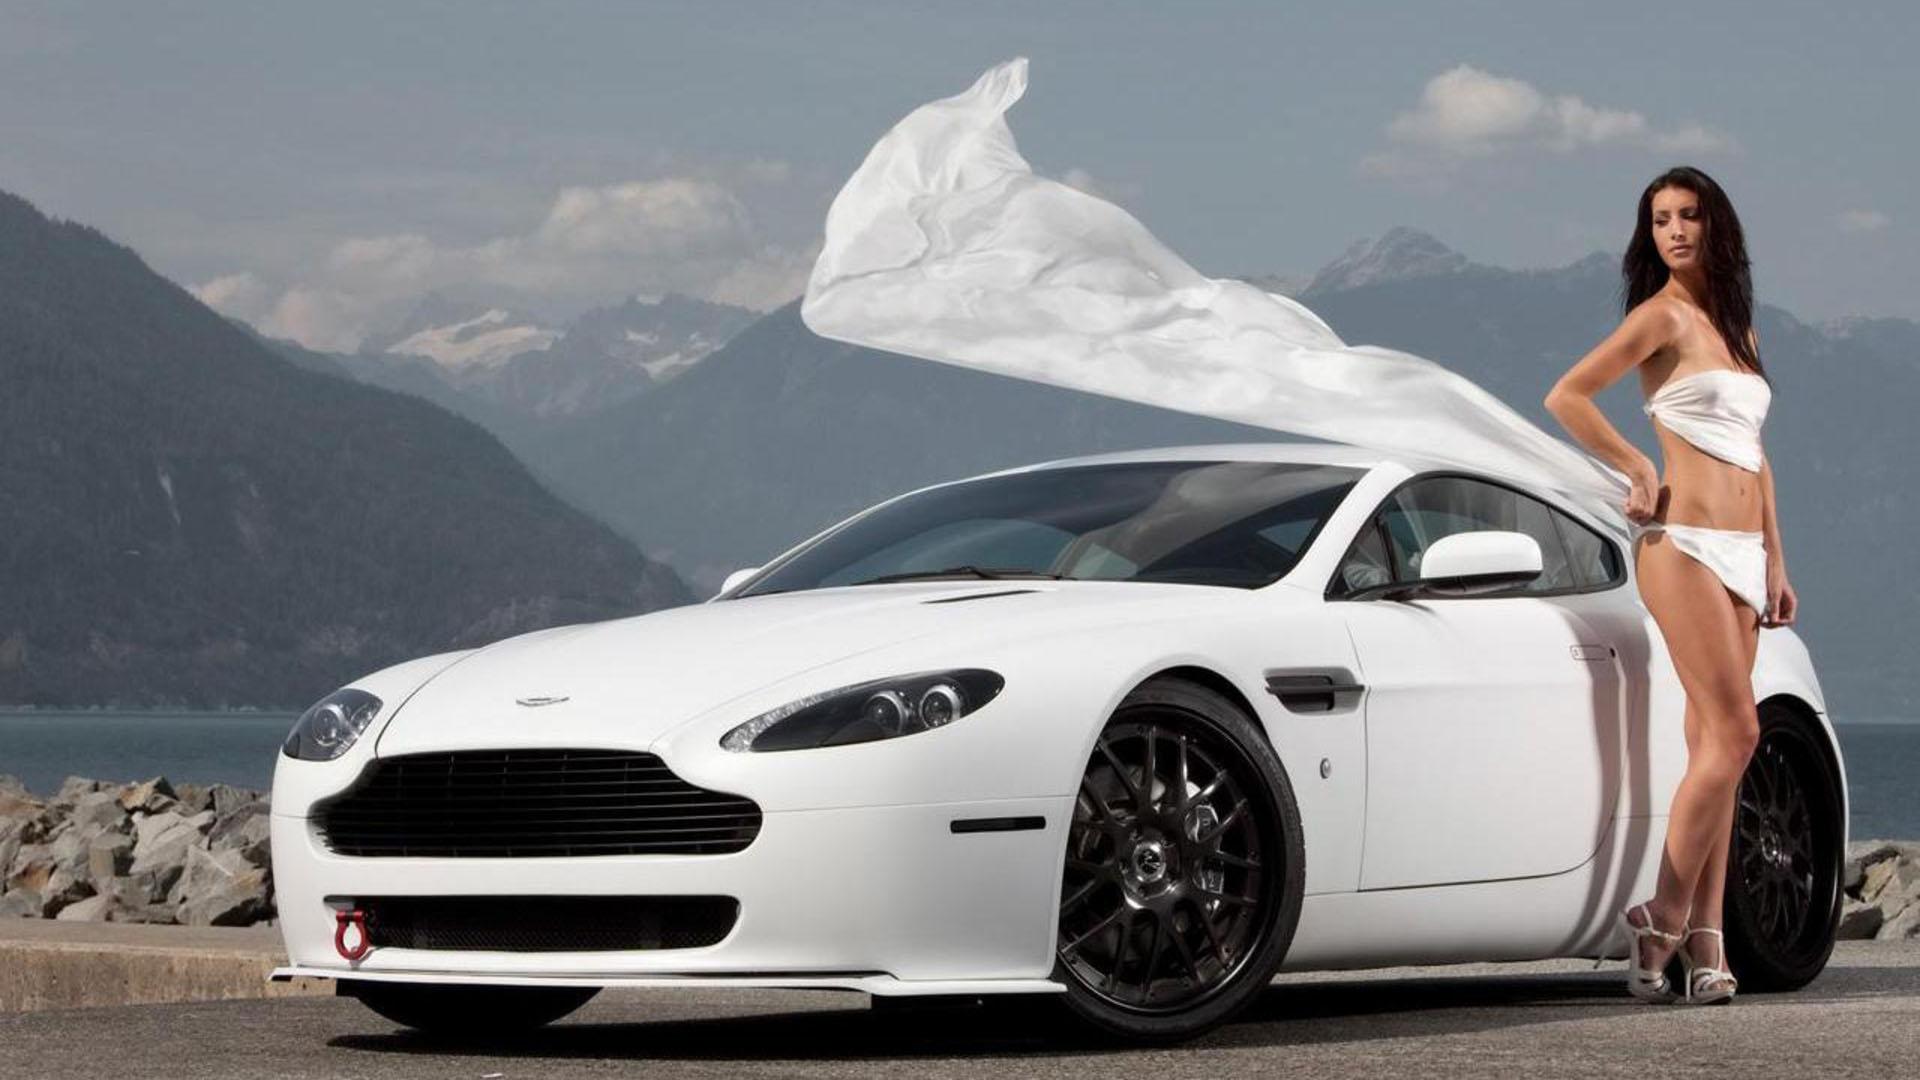 downlaod Nice Looking Car With Model Hd Wallpapers